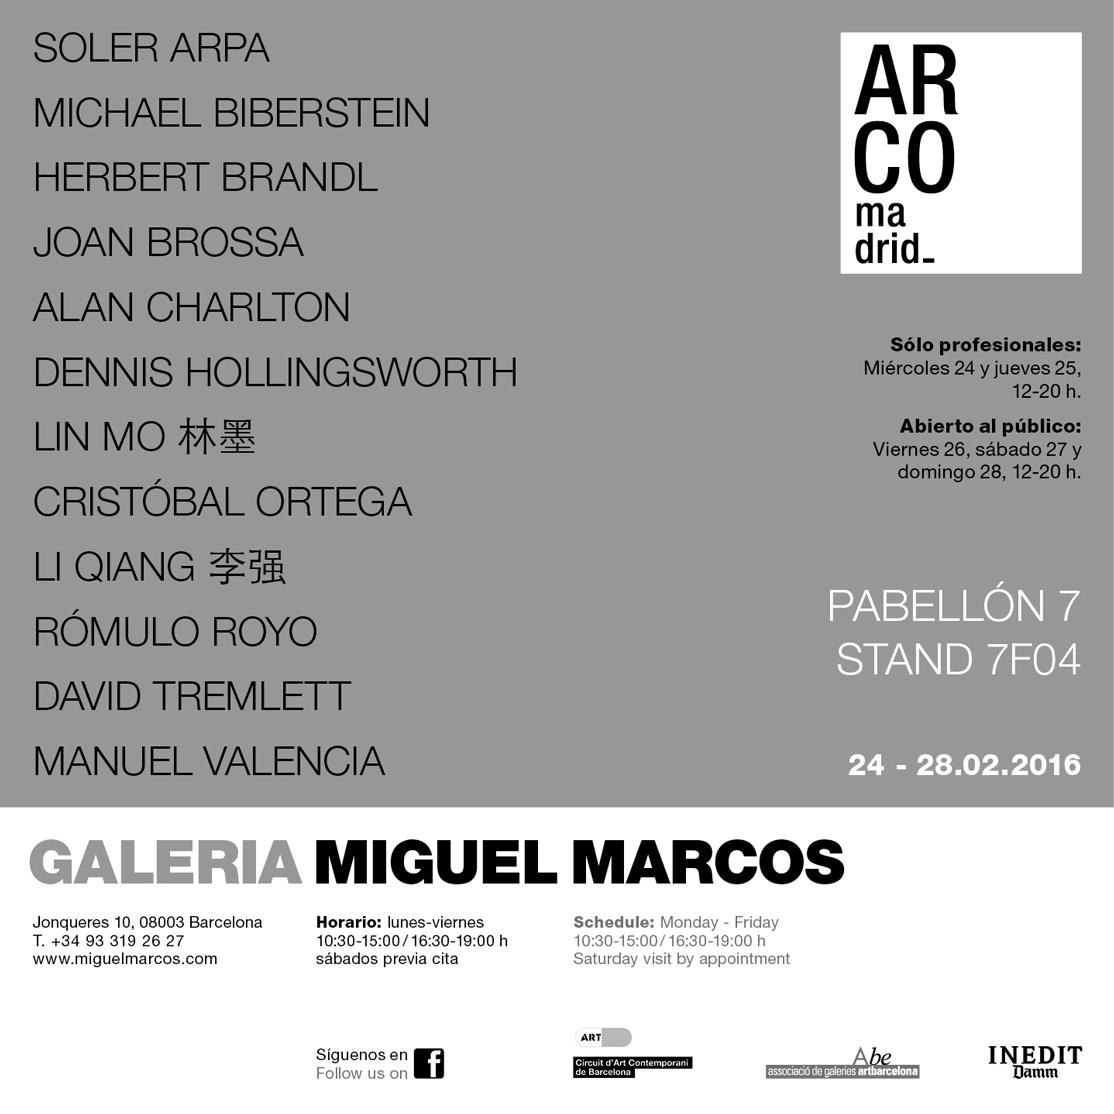 Miguel Marcos Gallery Banner Invitation